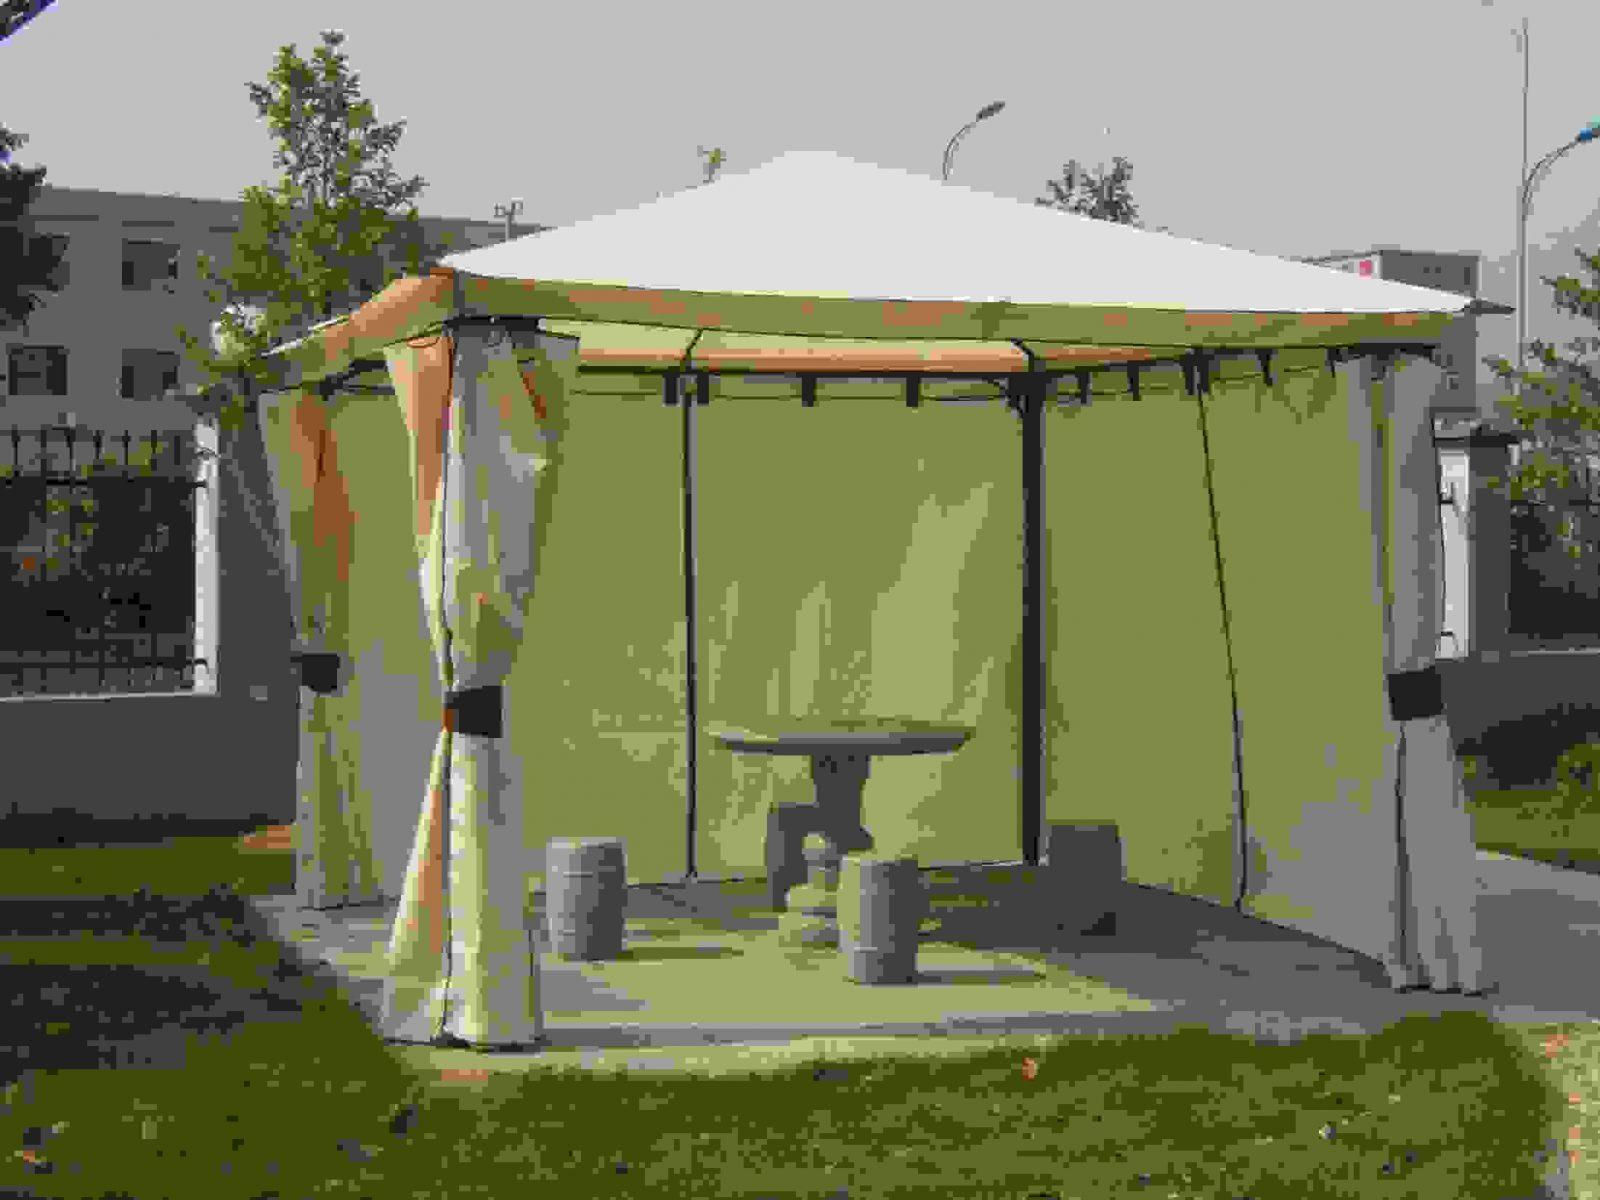 Groß Mobel Sätze Plus Gartenpavillon Pavillon Metall Von Pavillon von Pavillon 3X4 Wasserdicht Stabil Bild